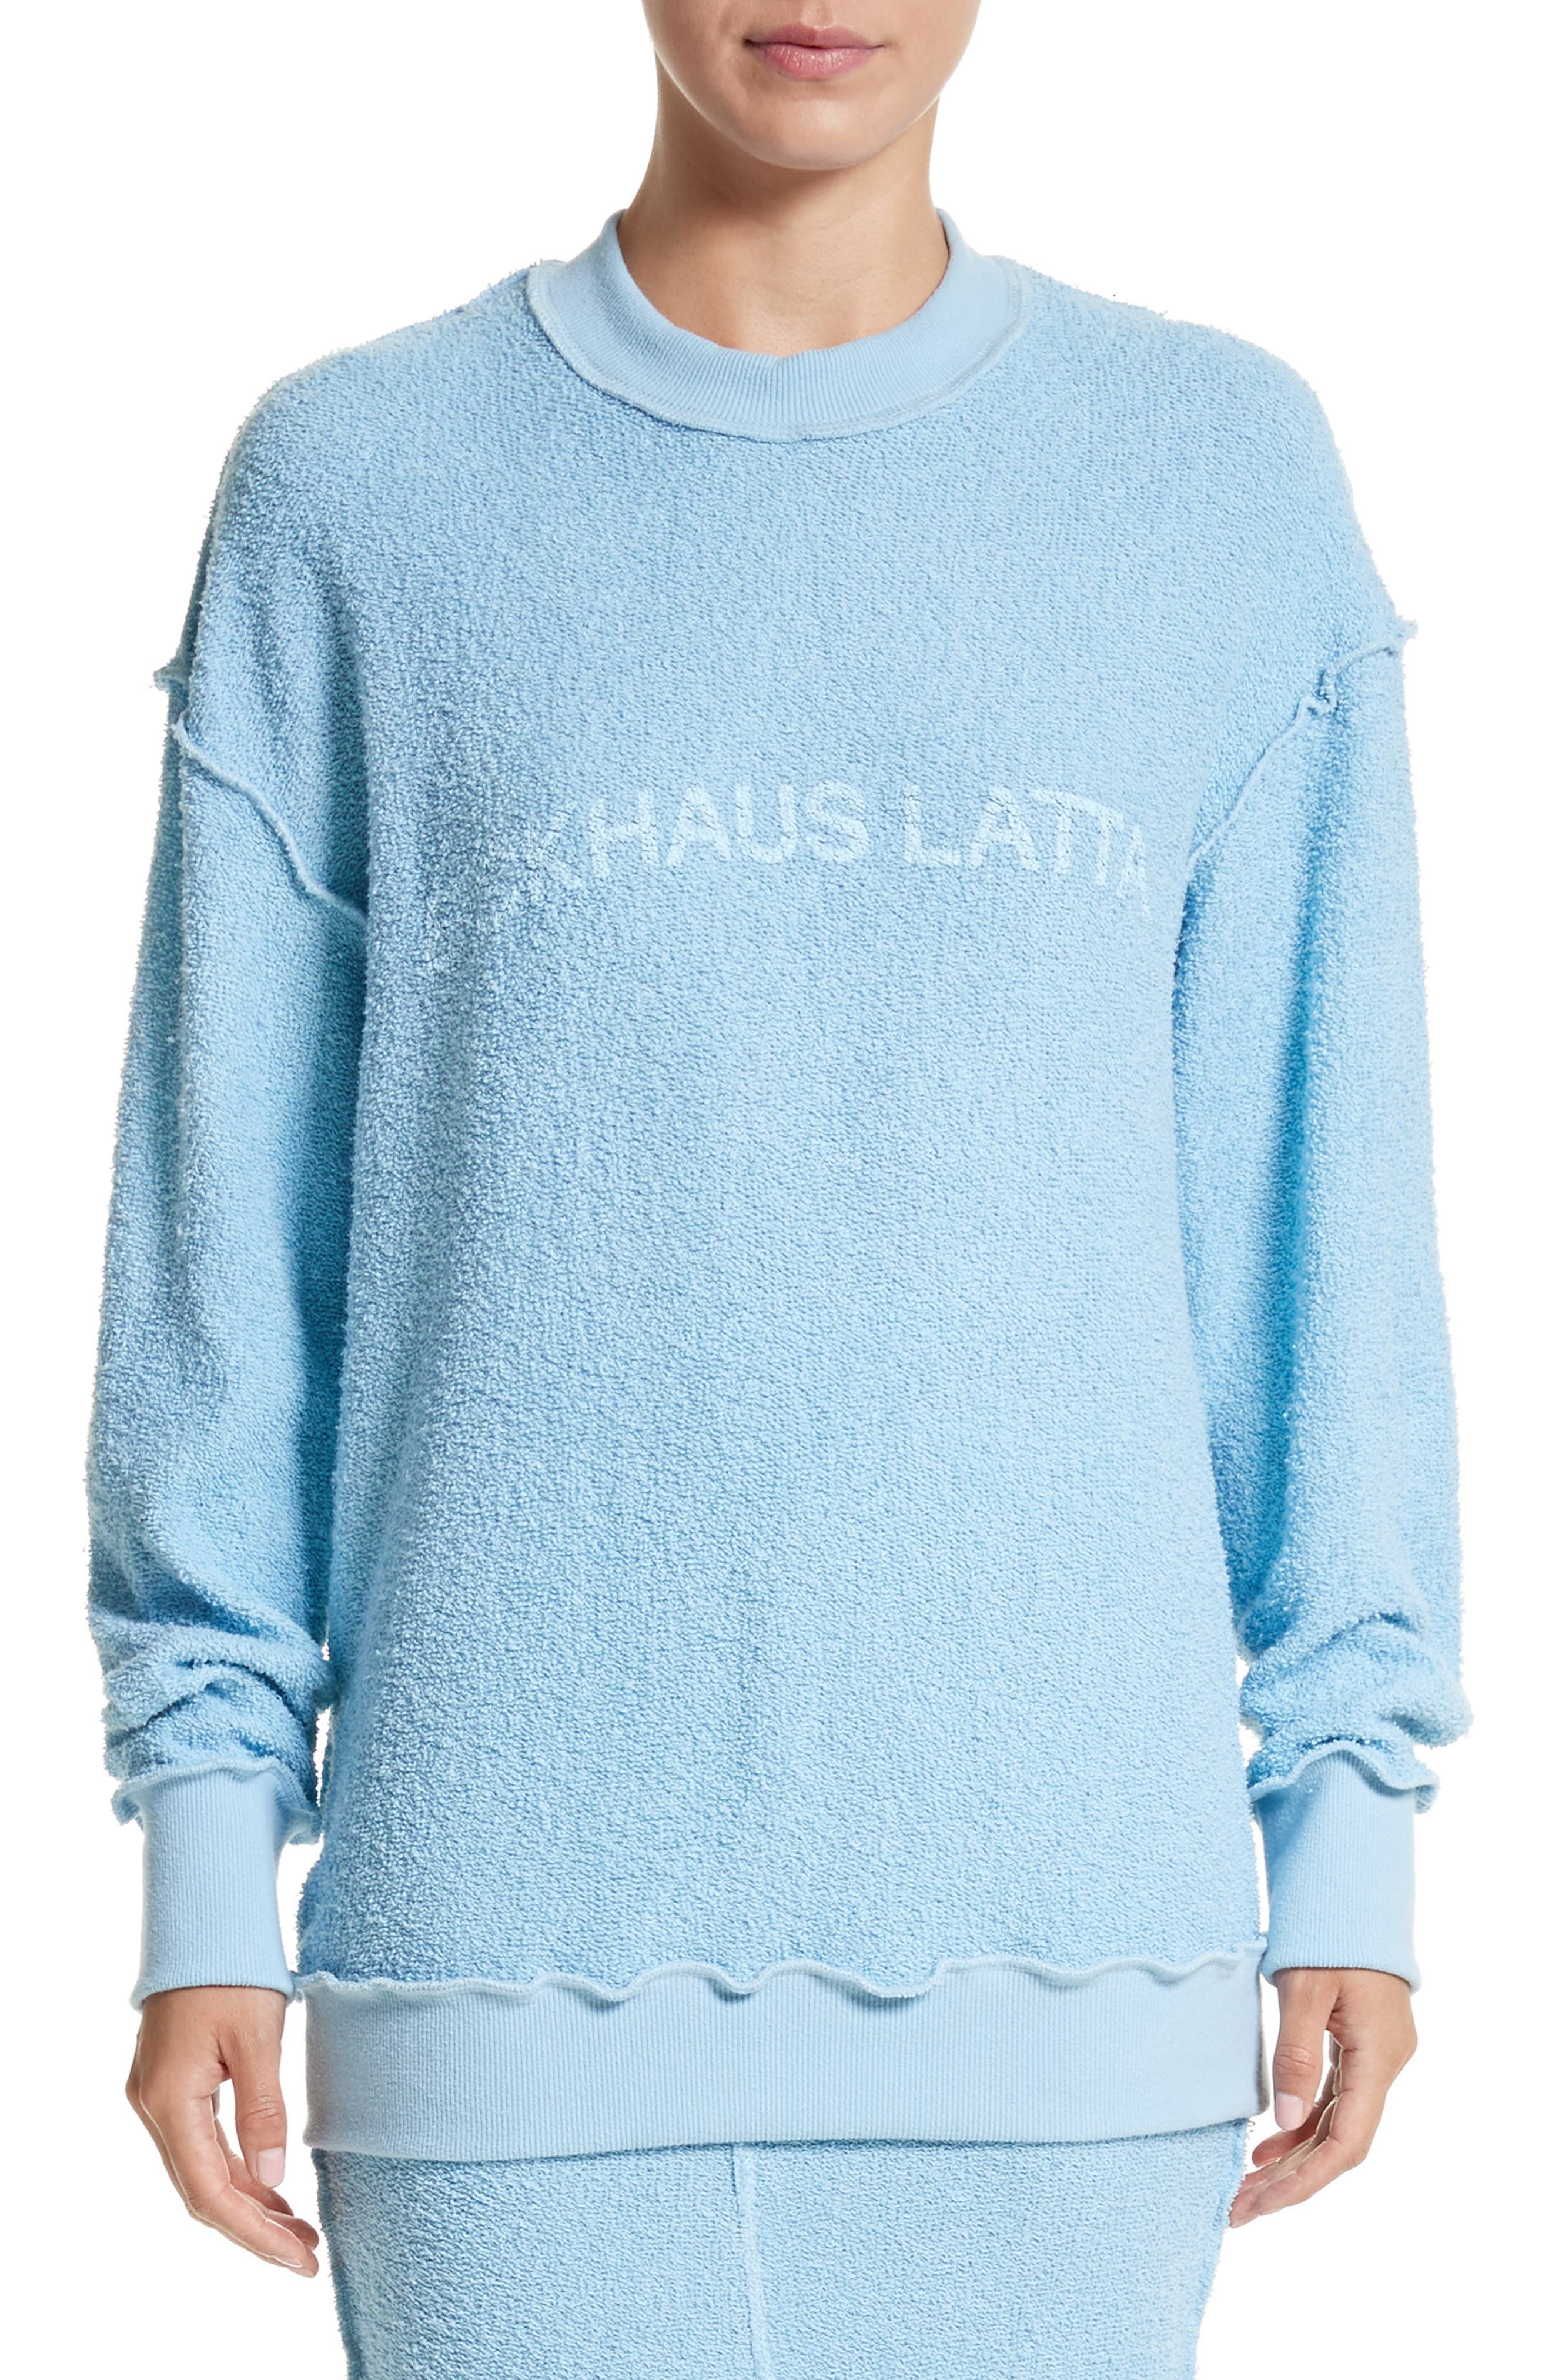 Alternate Image 1 Selected - Eckhaus Latta Drop Shoulder Reverse Terry Sweatshirt